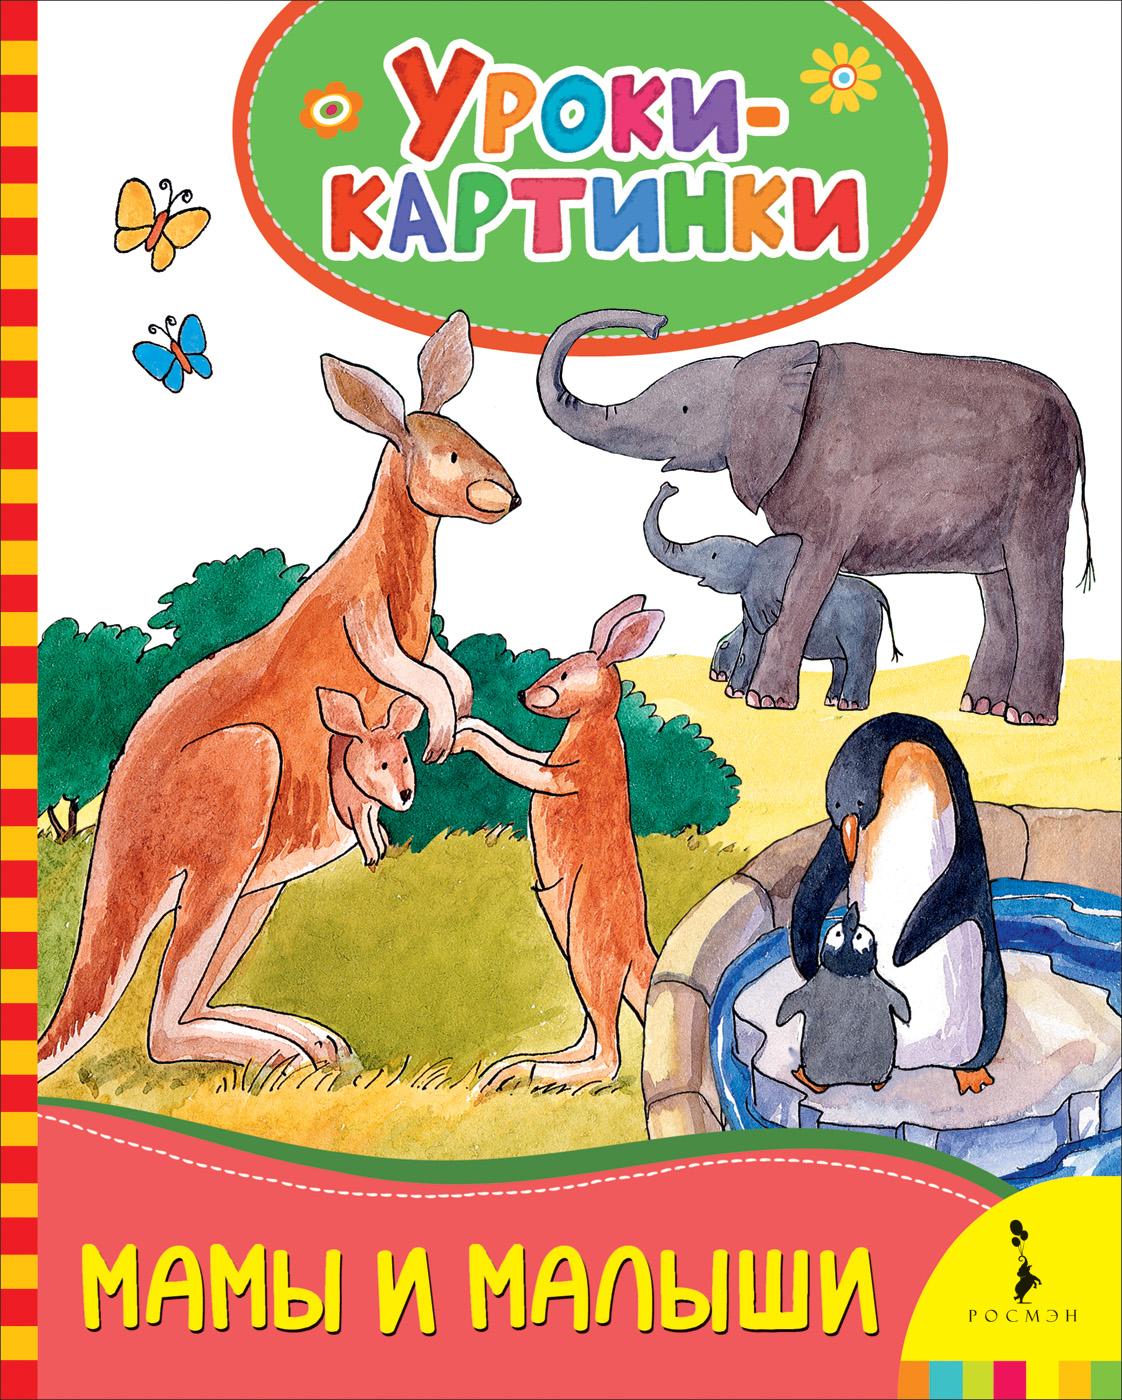 Е. К. Мазанова Мамы и малыши. Уроки-картинки картрайт п кирпичная кладка уроки мастера